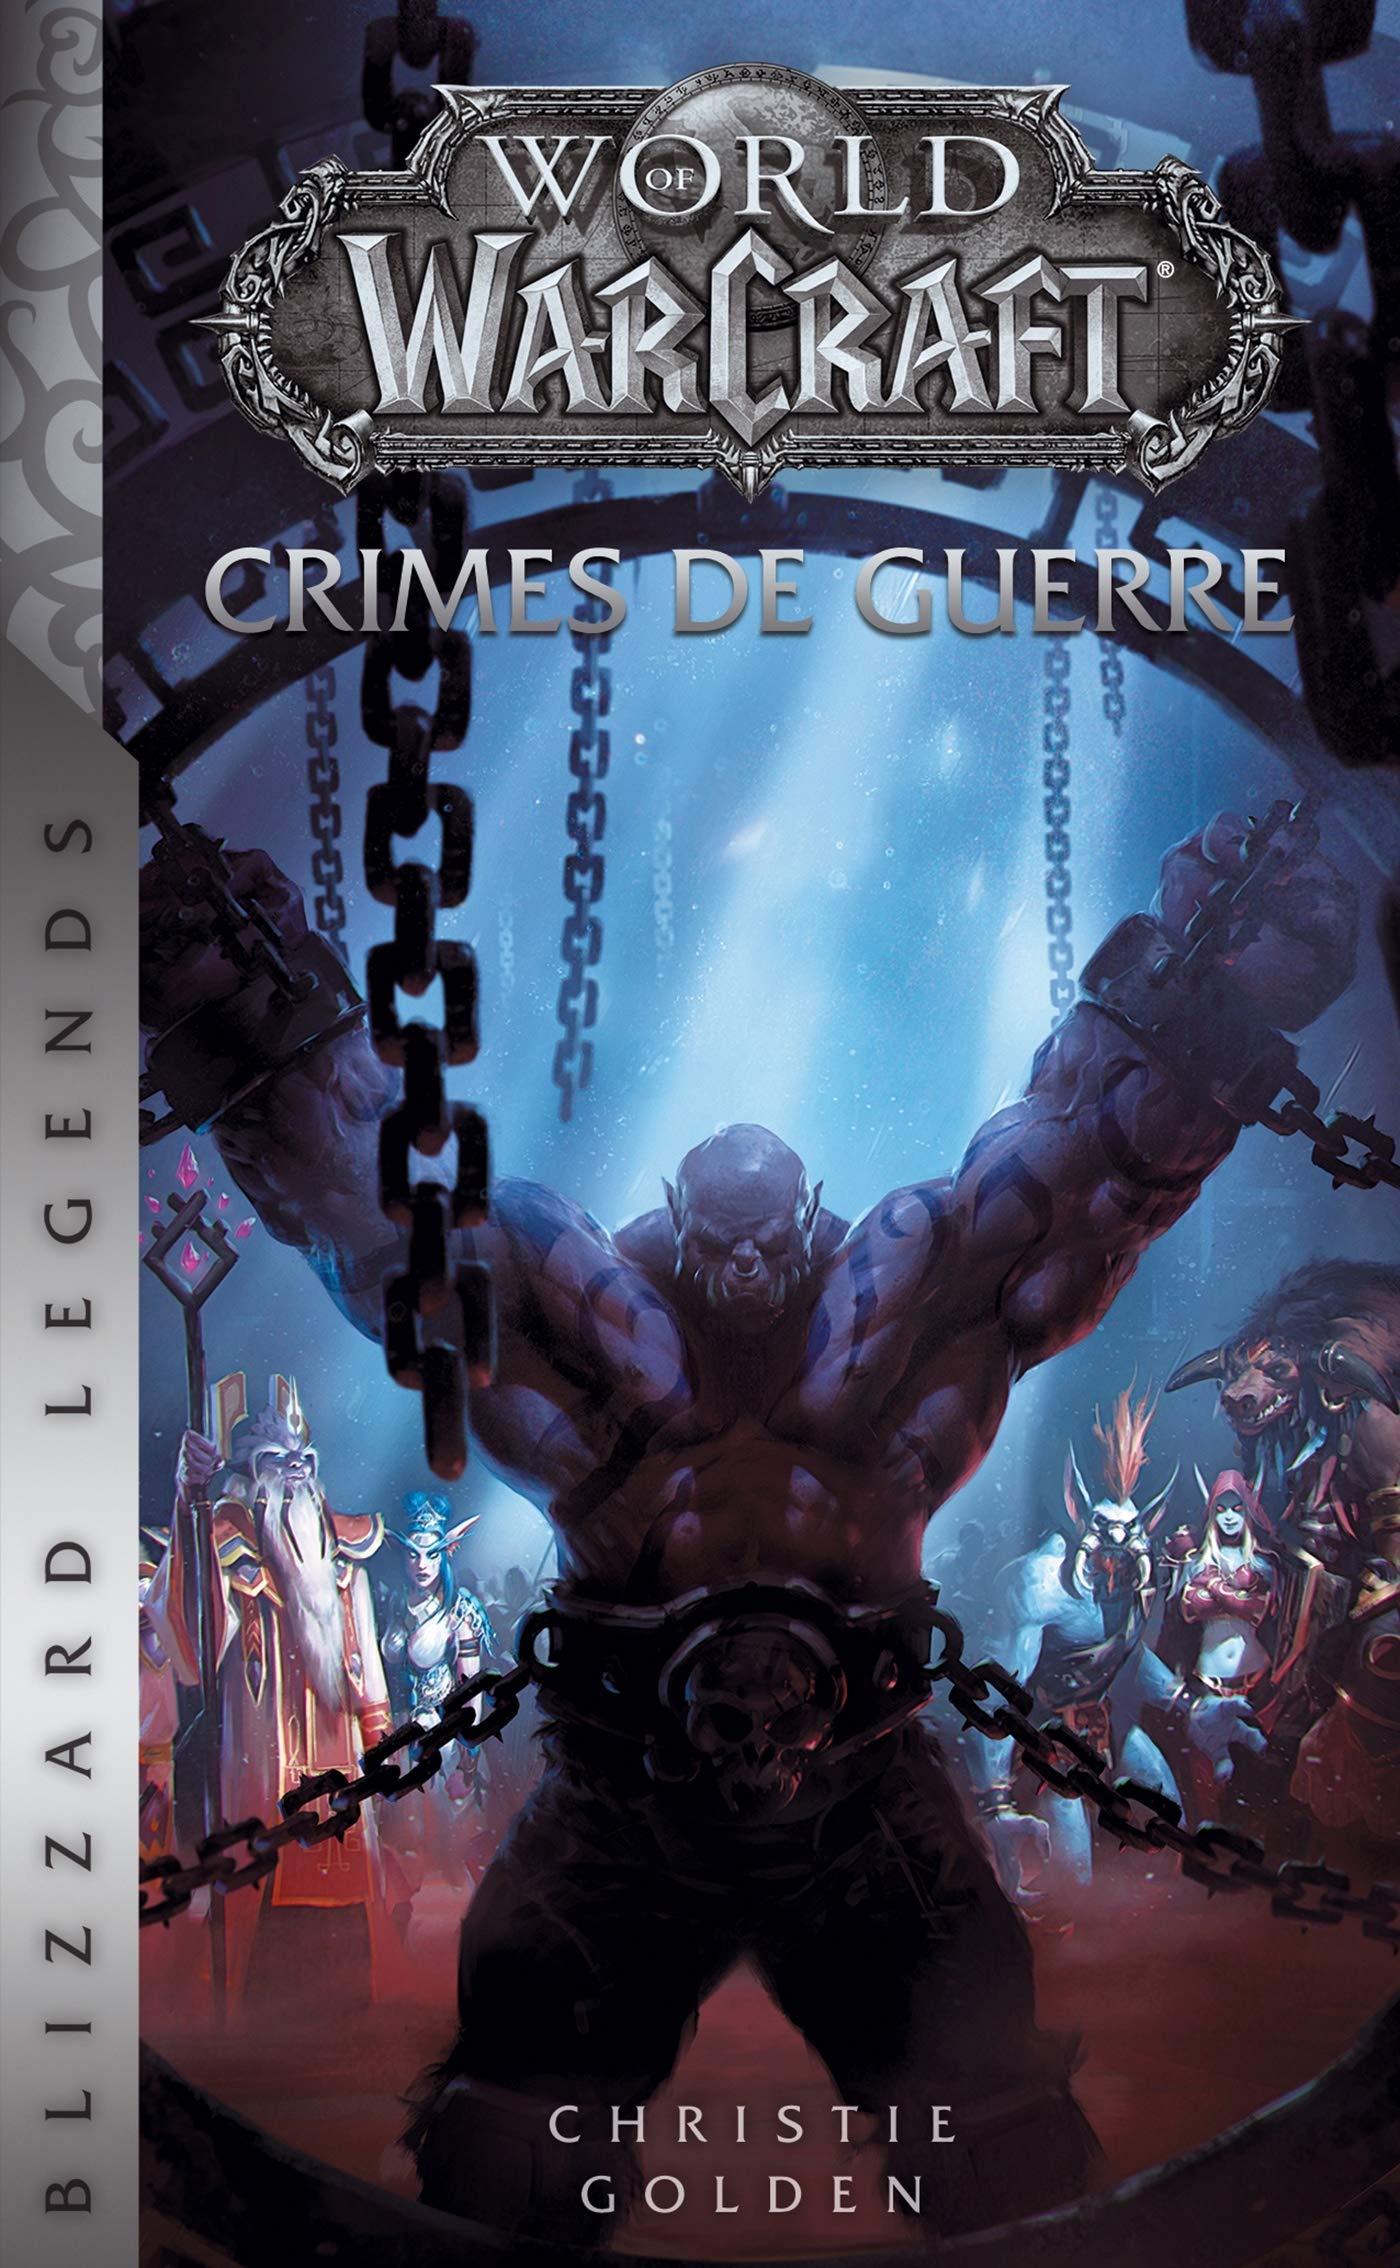 World of Warcraft Crimes de guerre (NED) C